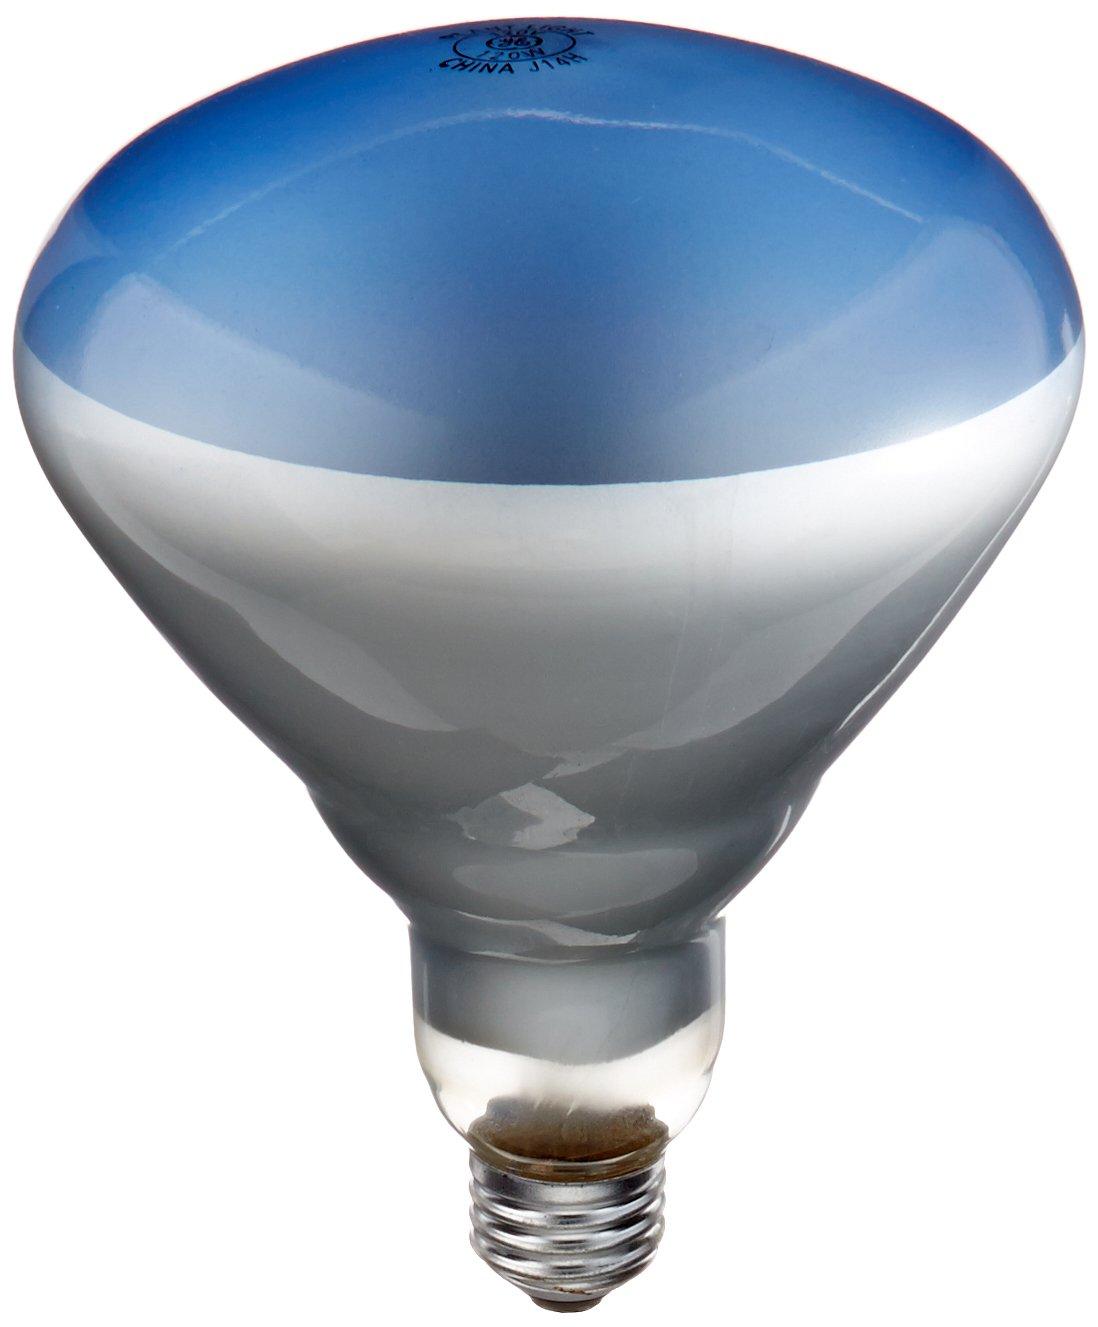 Rayvern Lighting Supply